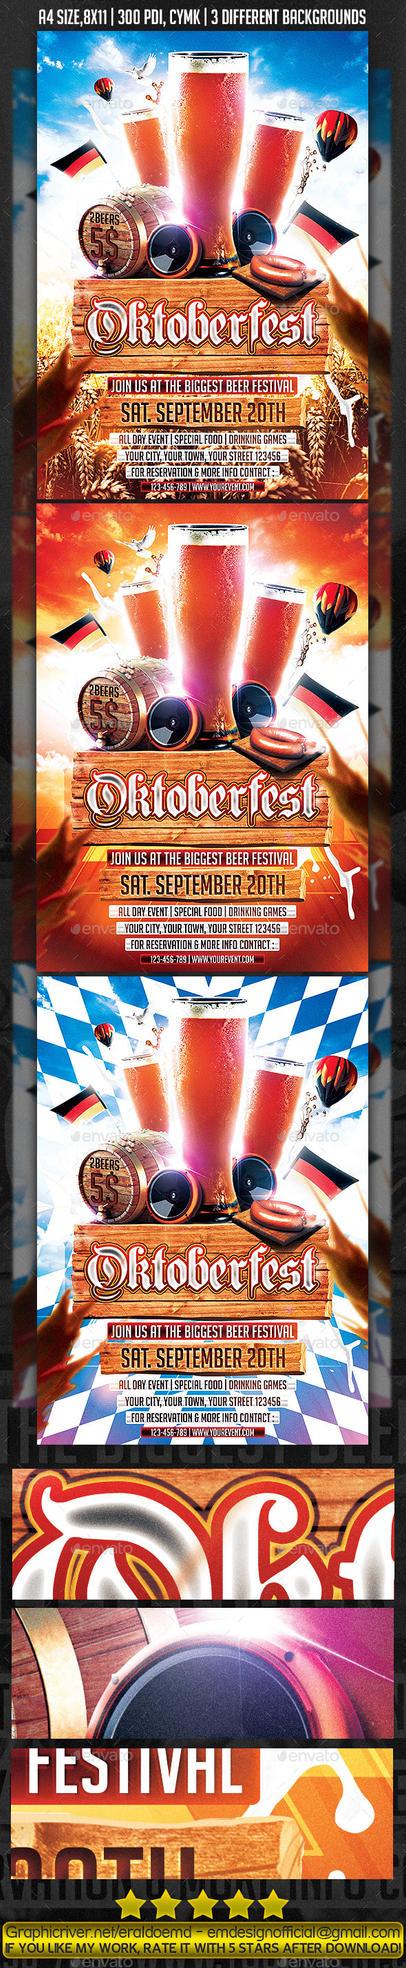 Oktoberfest Flyer / Poster by EmDesignEmd